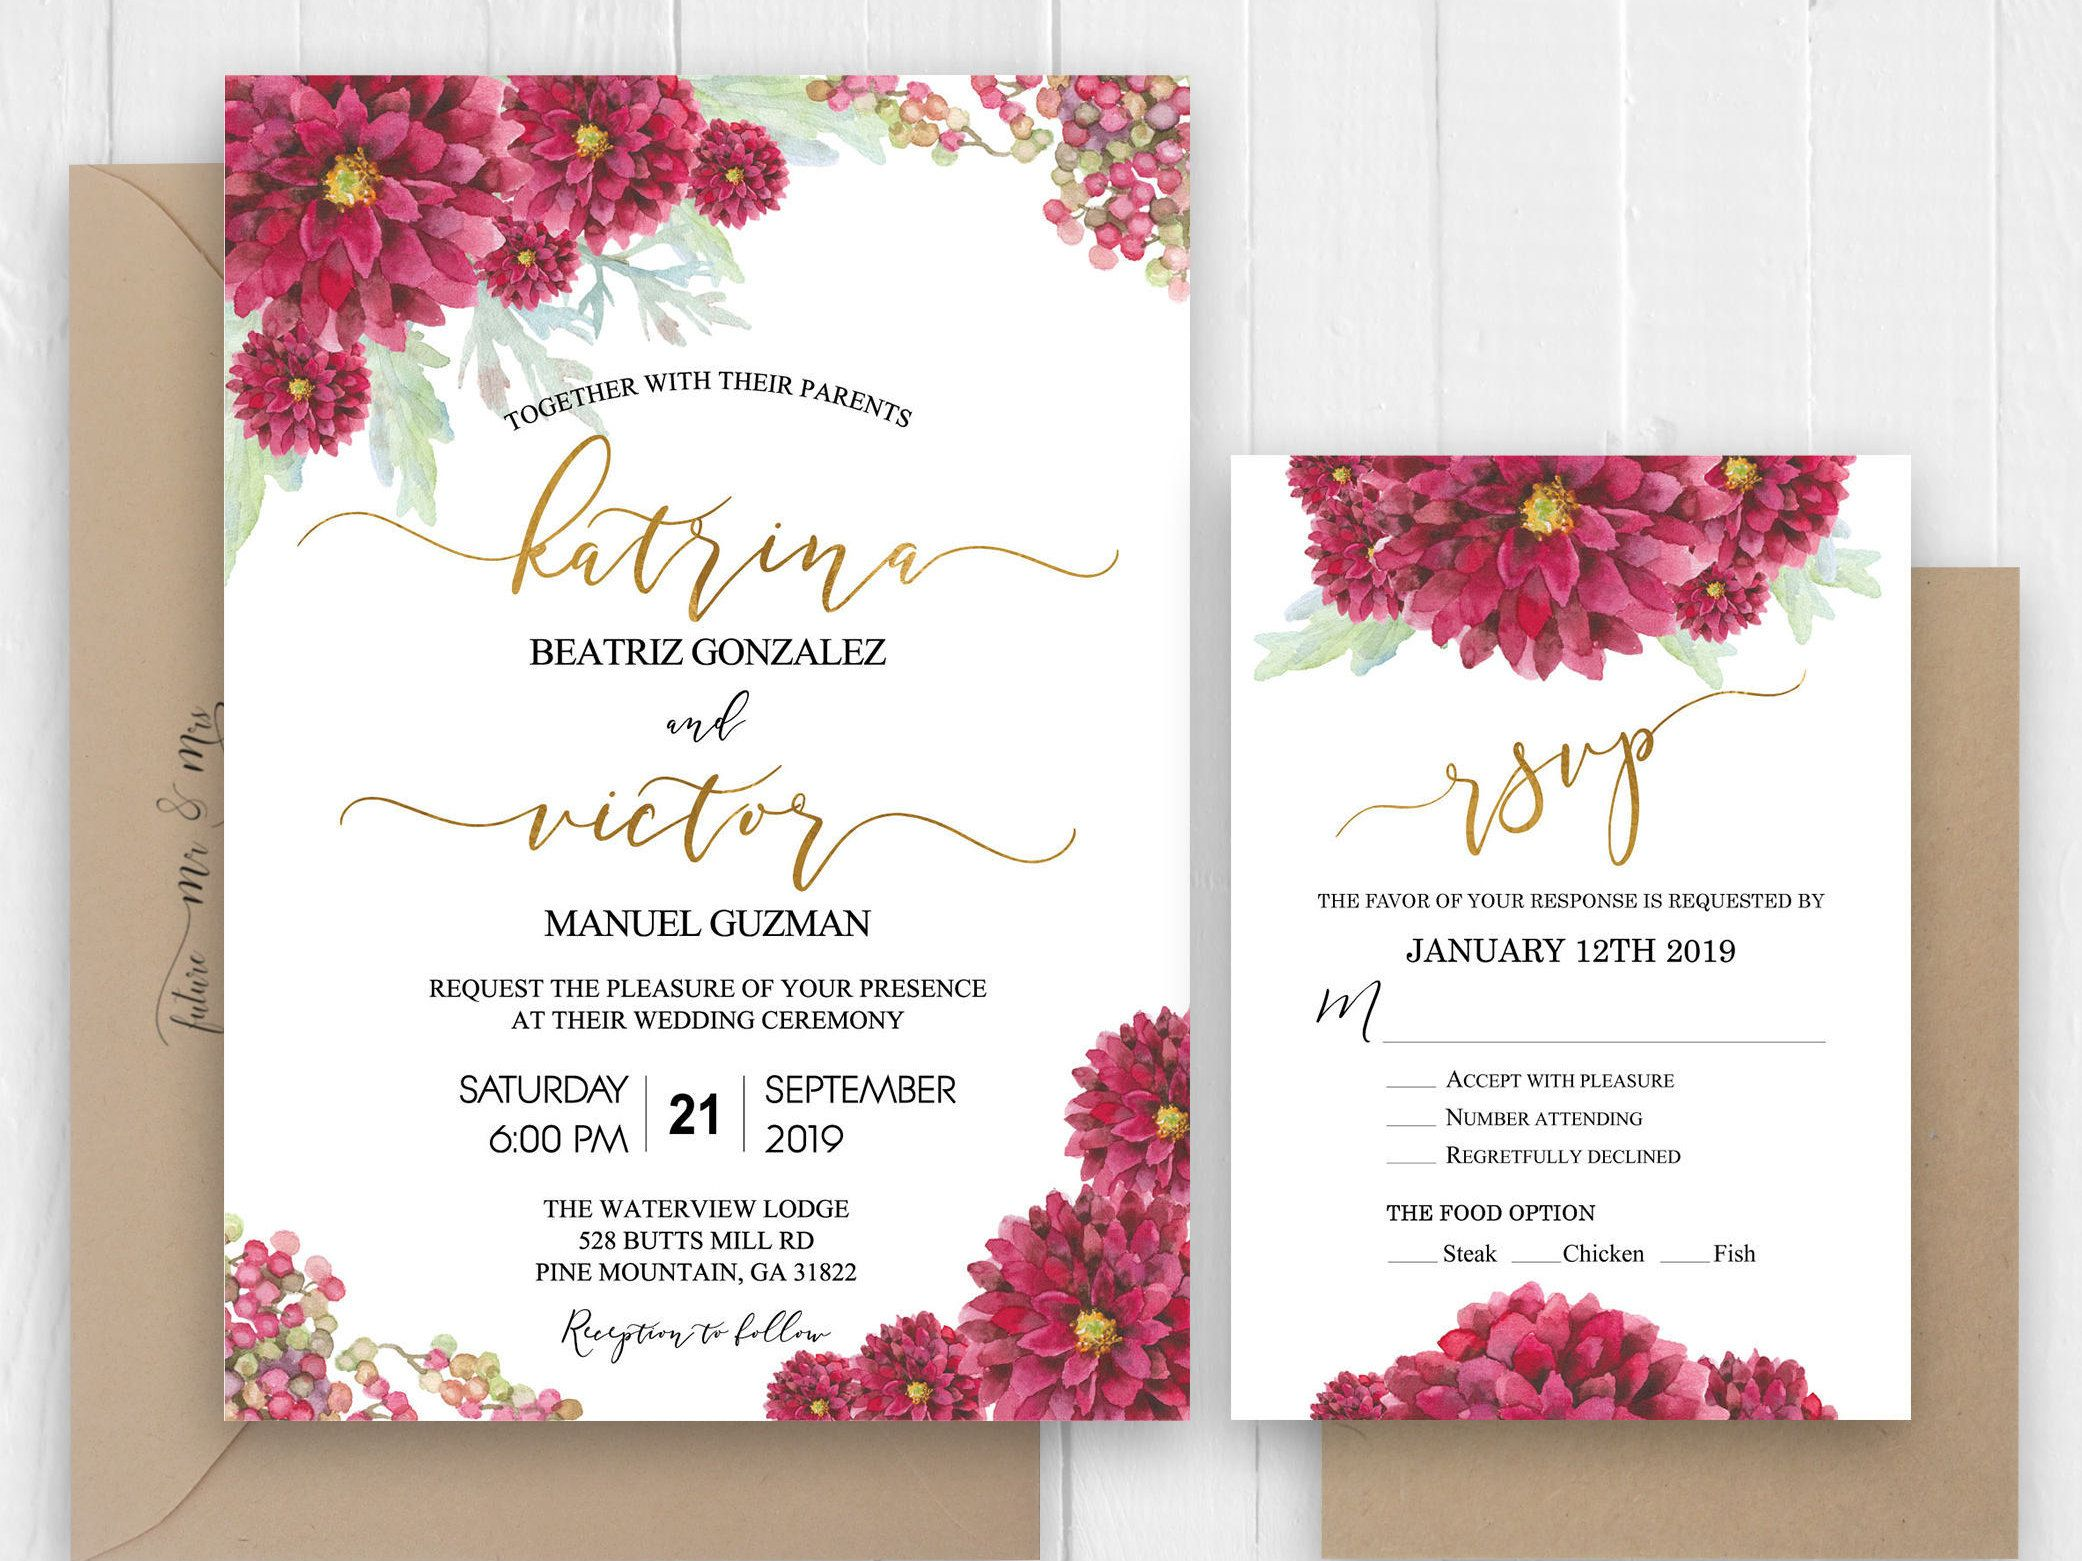 Burgundy Gold Wedding Invitation, Free Envelope RSVP Card